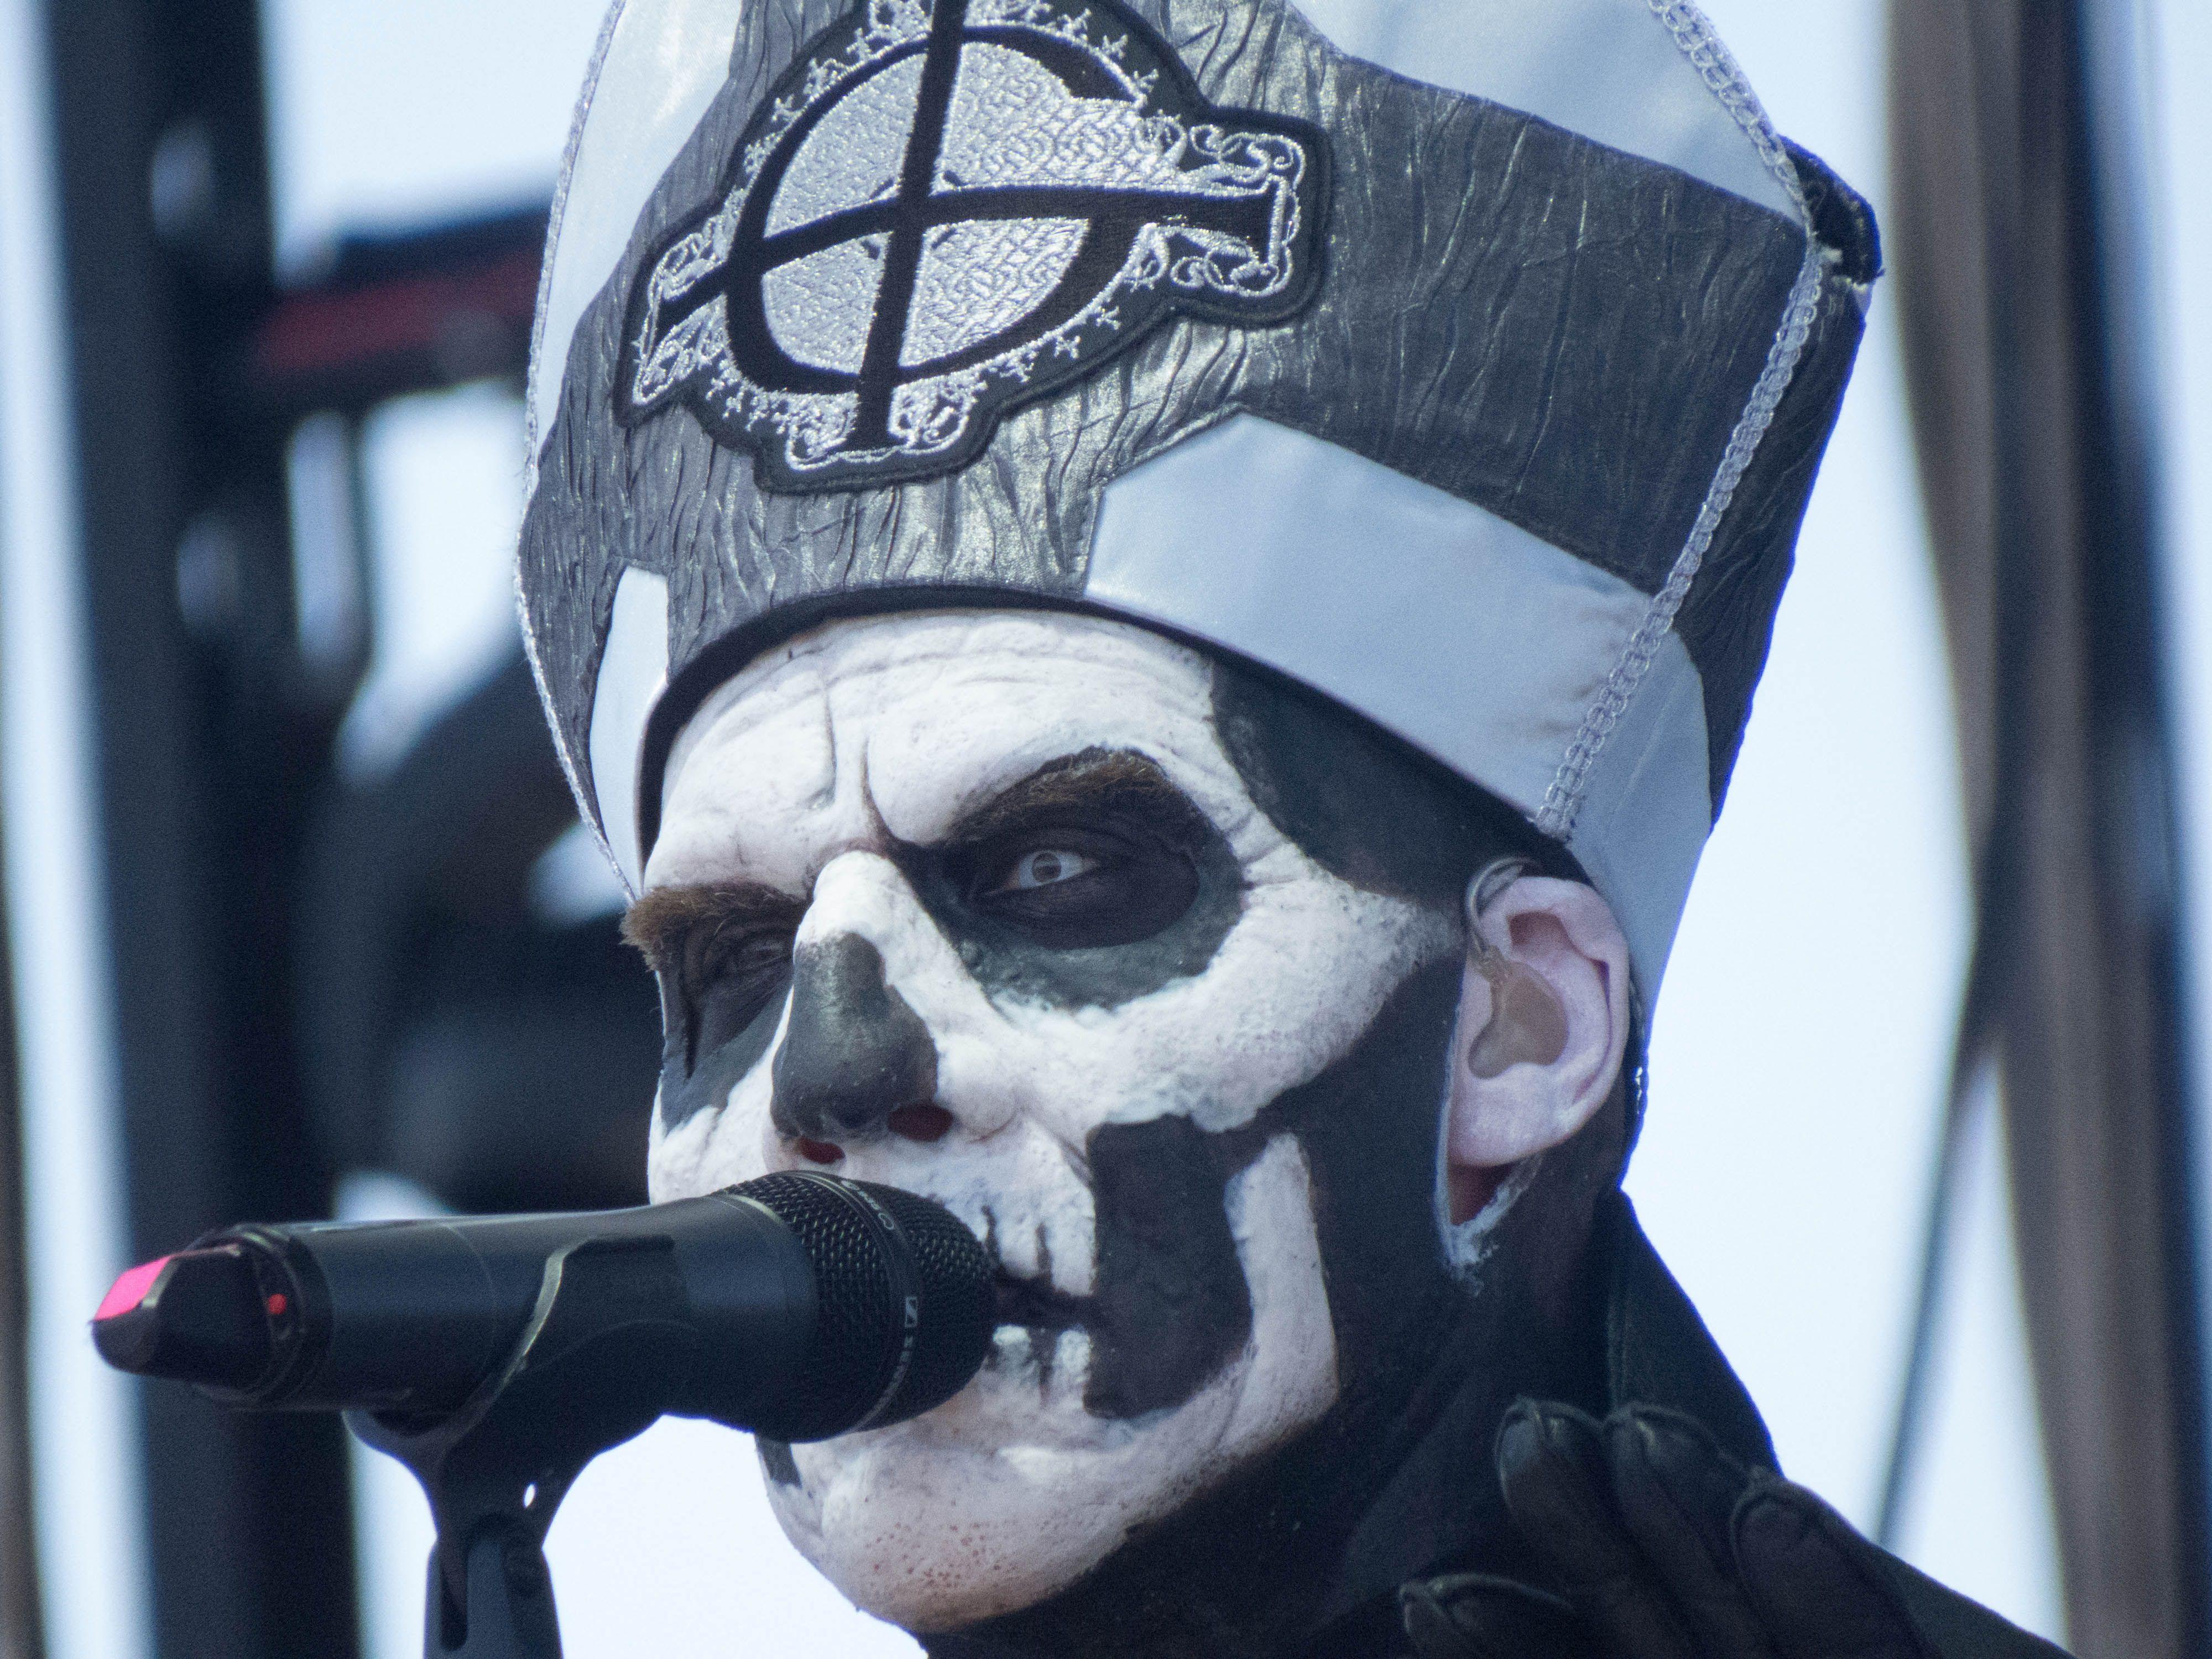 Papa Emeritus II (Ghost B.C.) - Coachella 2013   Music   Pinterest ...